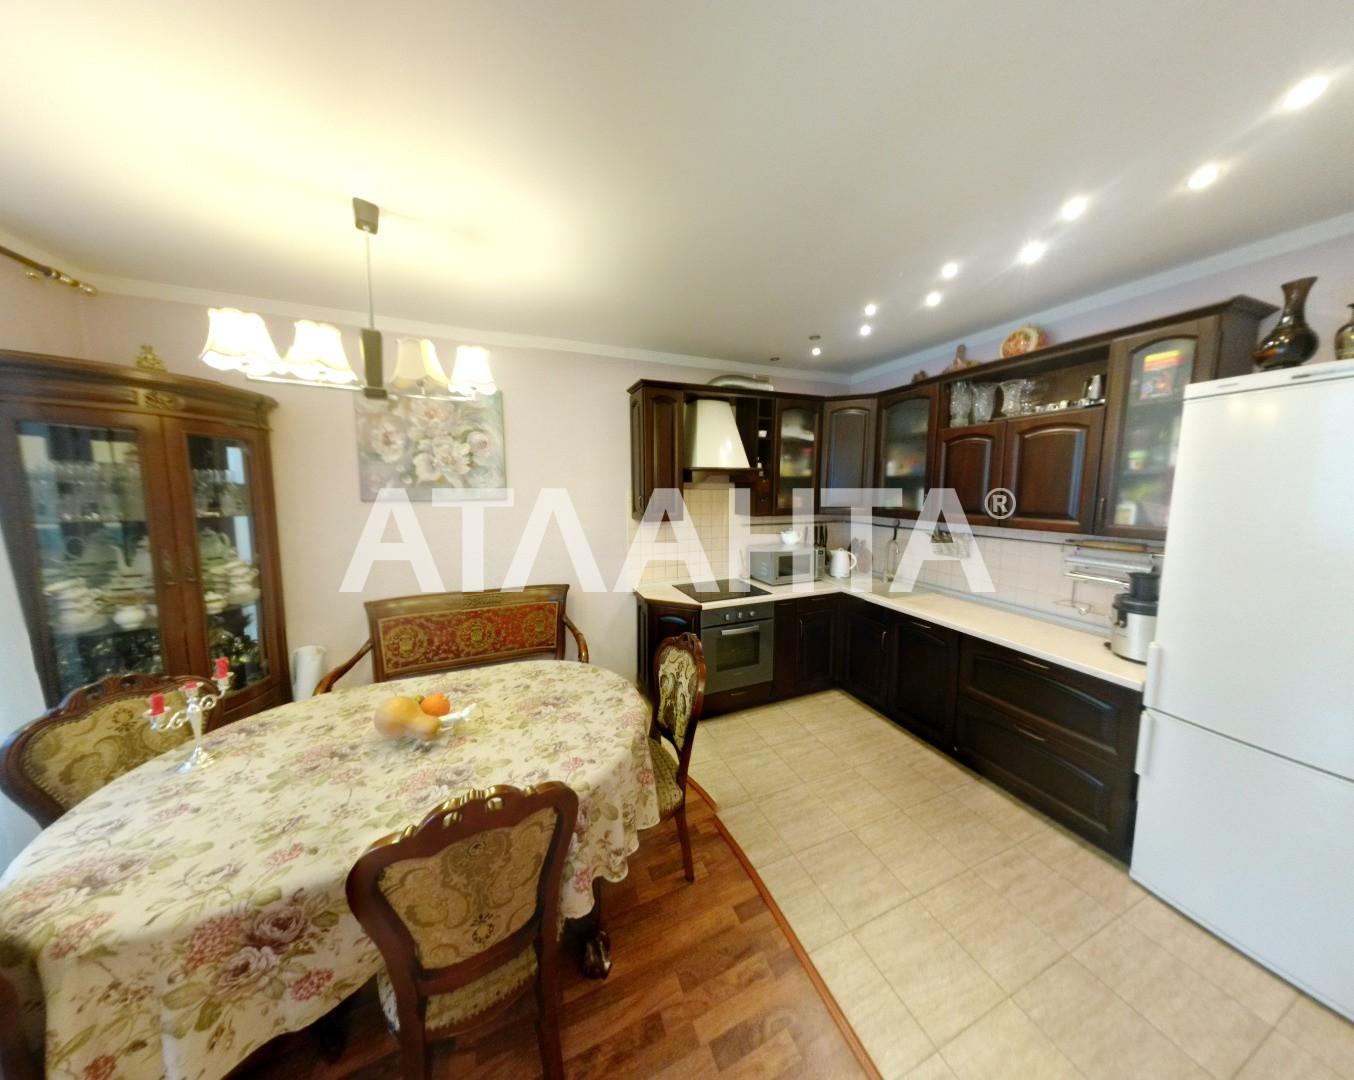 Продается 3-комнатная Квартира на ул. Ул. Ломоносова — 139 600 у.е. (фото №5)